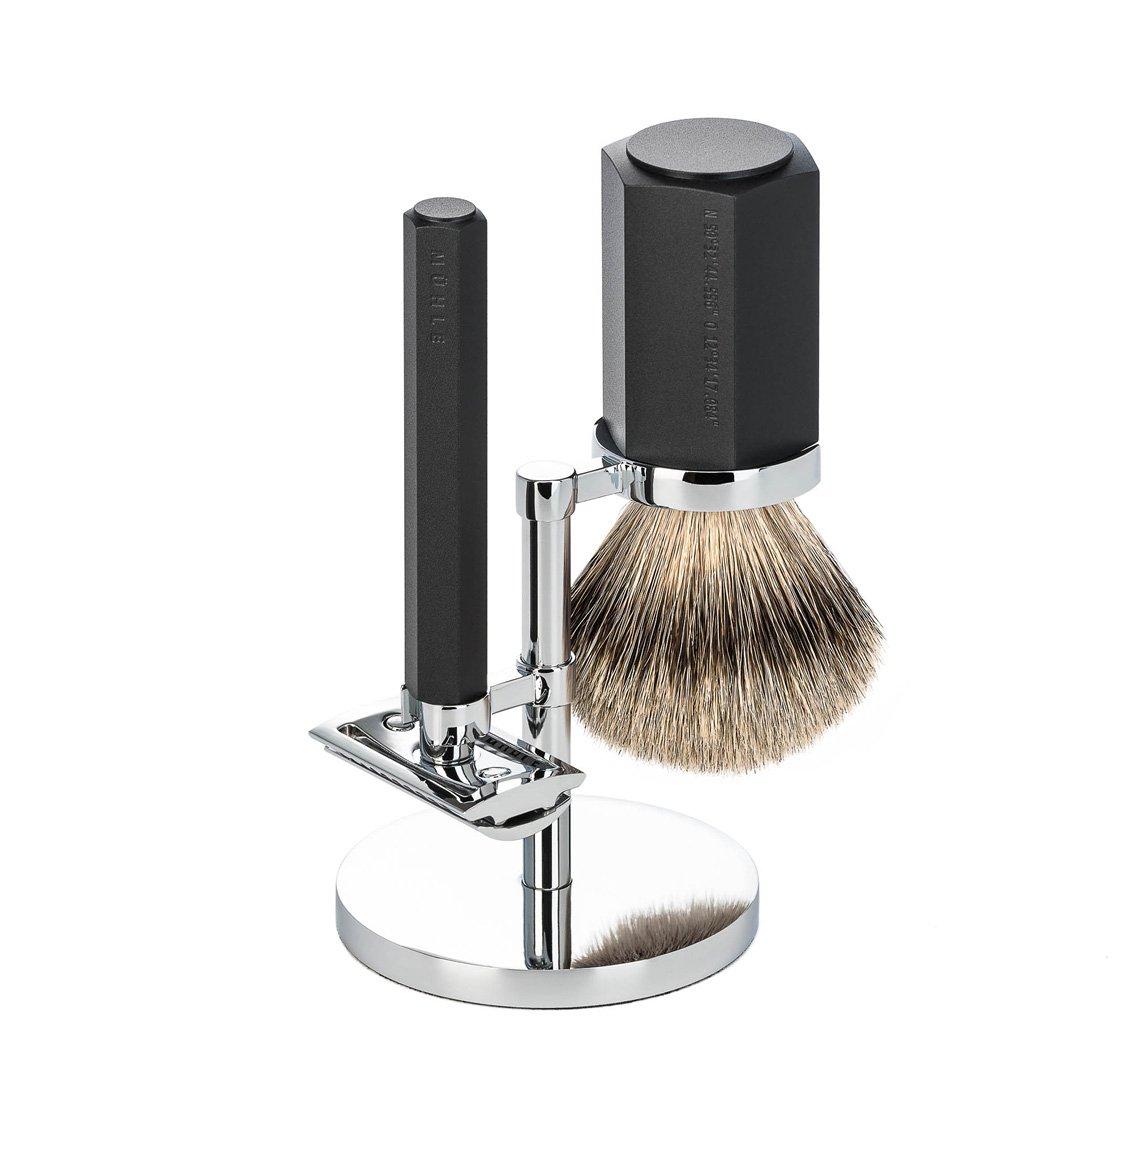 Muhle Shaving Set Silvertip Badger Brush With Safety Razor Limited Edition